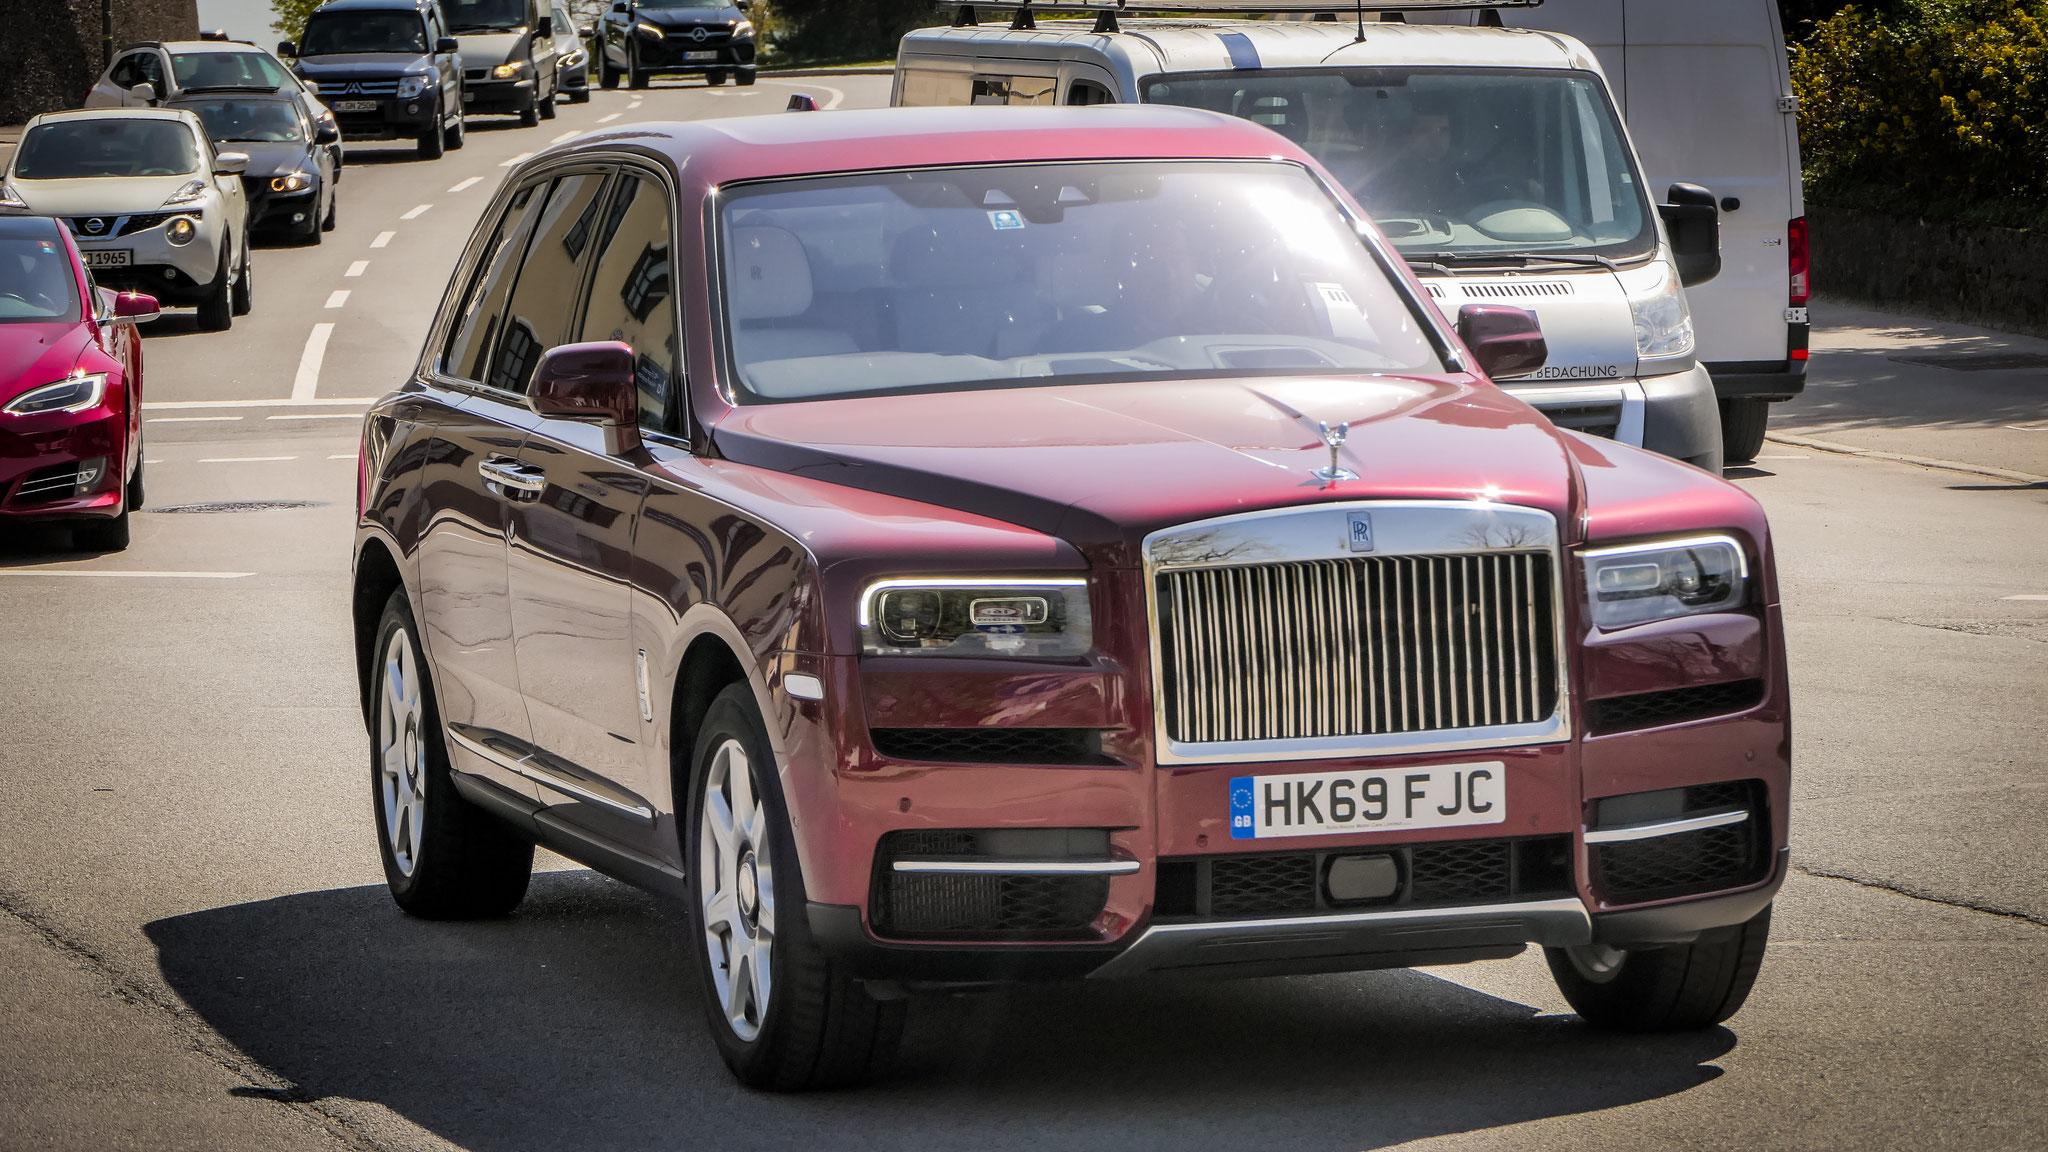 Rolls Royce Cullinan - HK69-FJC (GB)